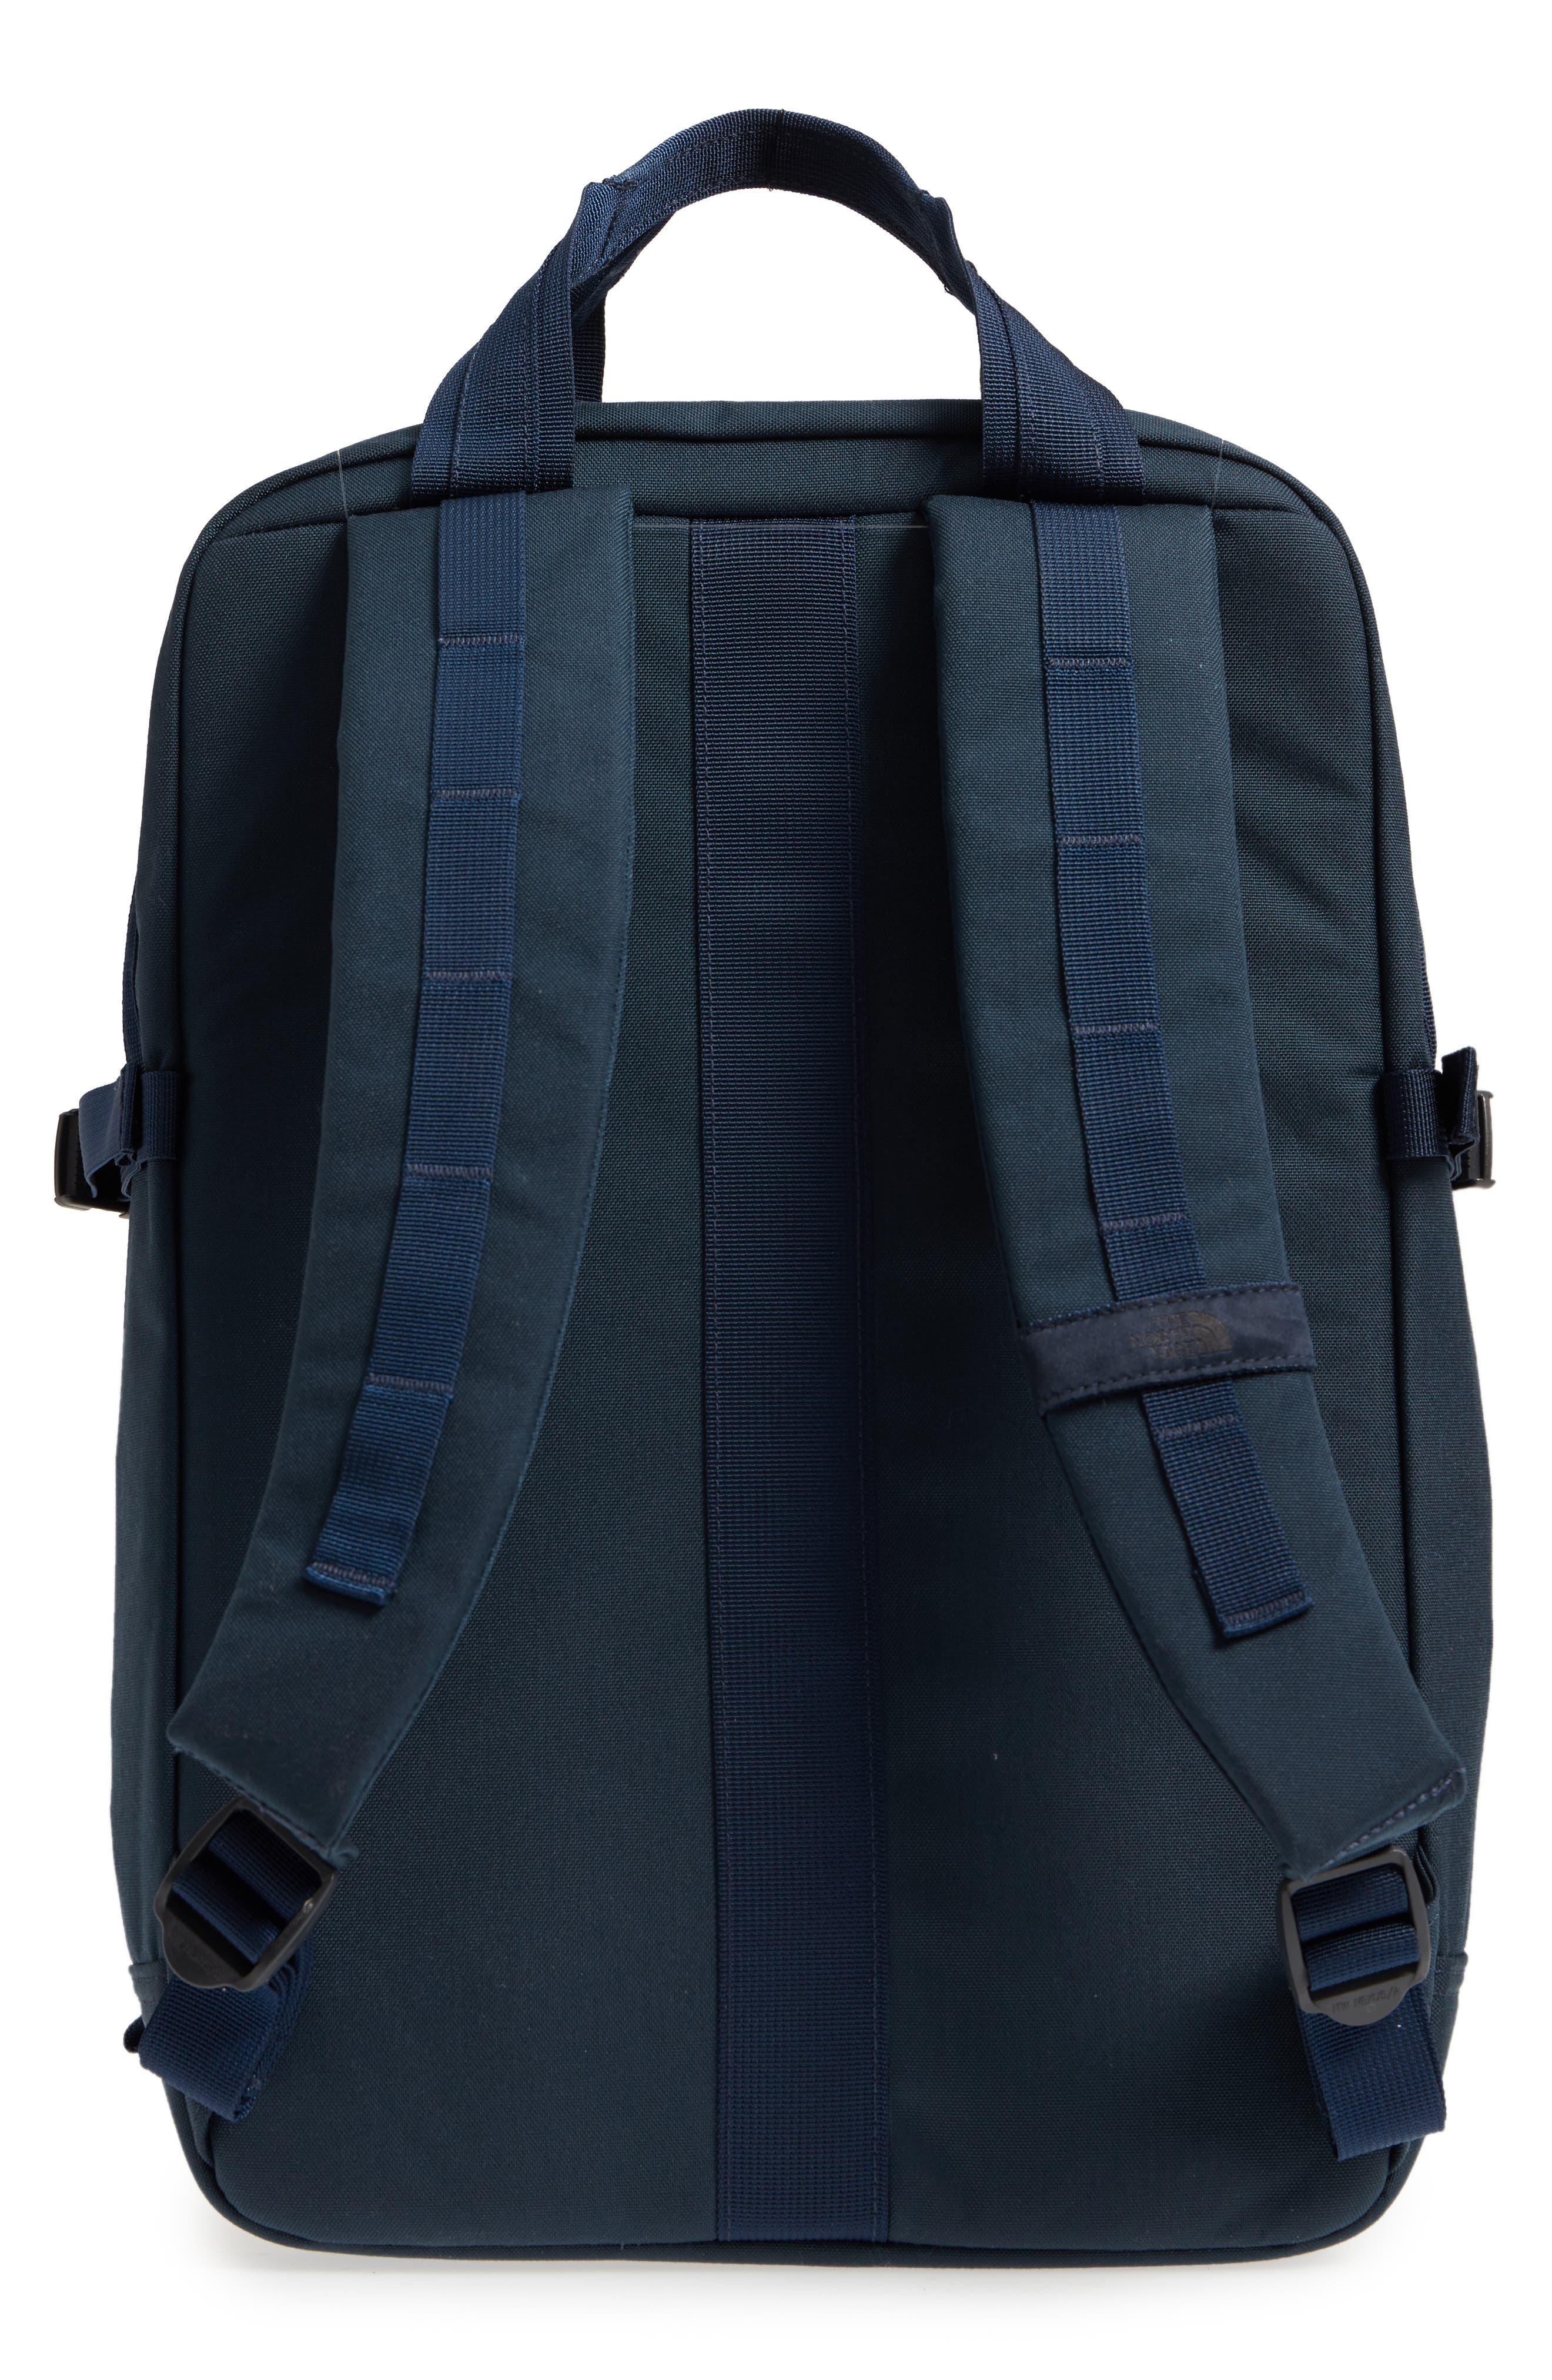 Mini Crevasse Backpack,                             Alternate thumbnail 2, color,                             Urban Navy Heather/ Urban Navy